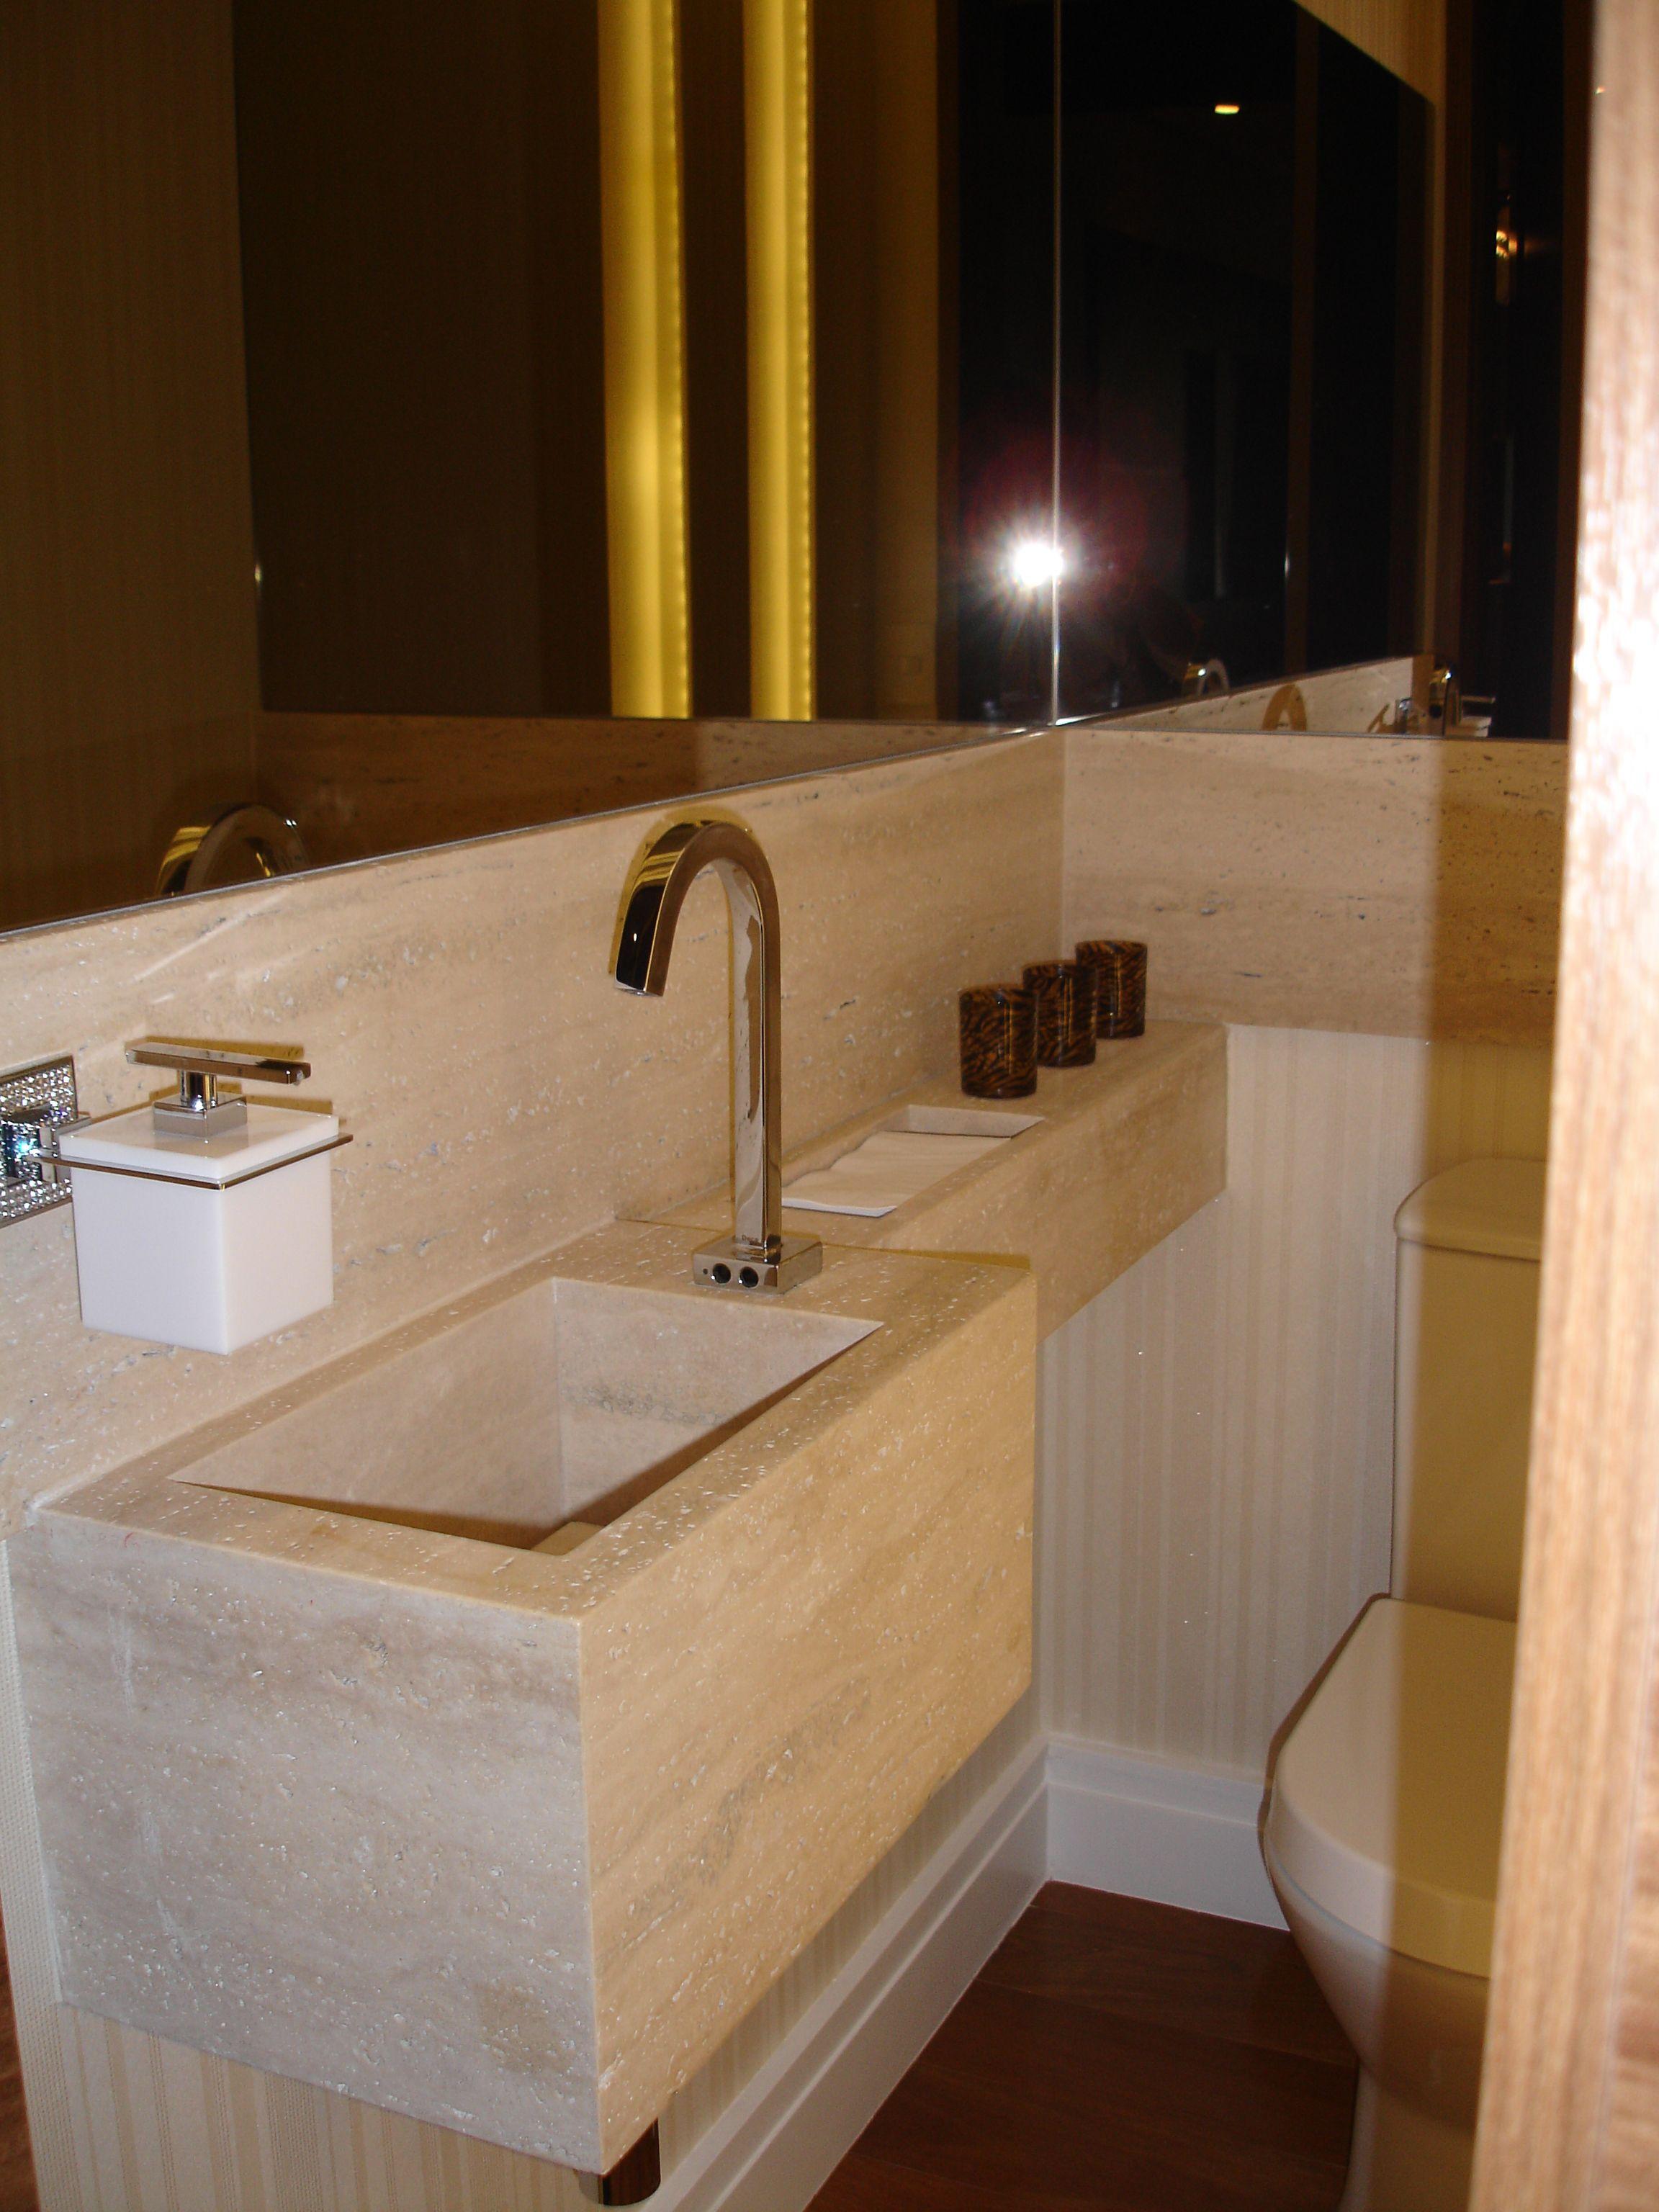 Lavabo com cuba esculpida  Banheiros  Pinterest  Decoration -> Cuba Para Banheiro Pequena